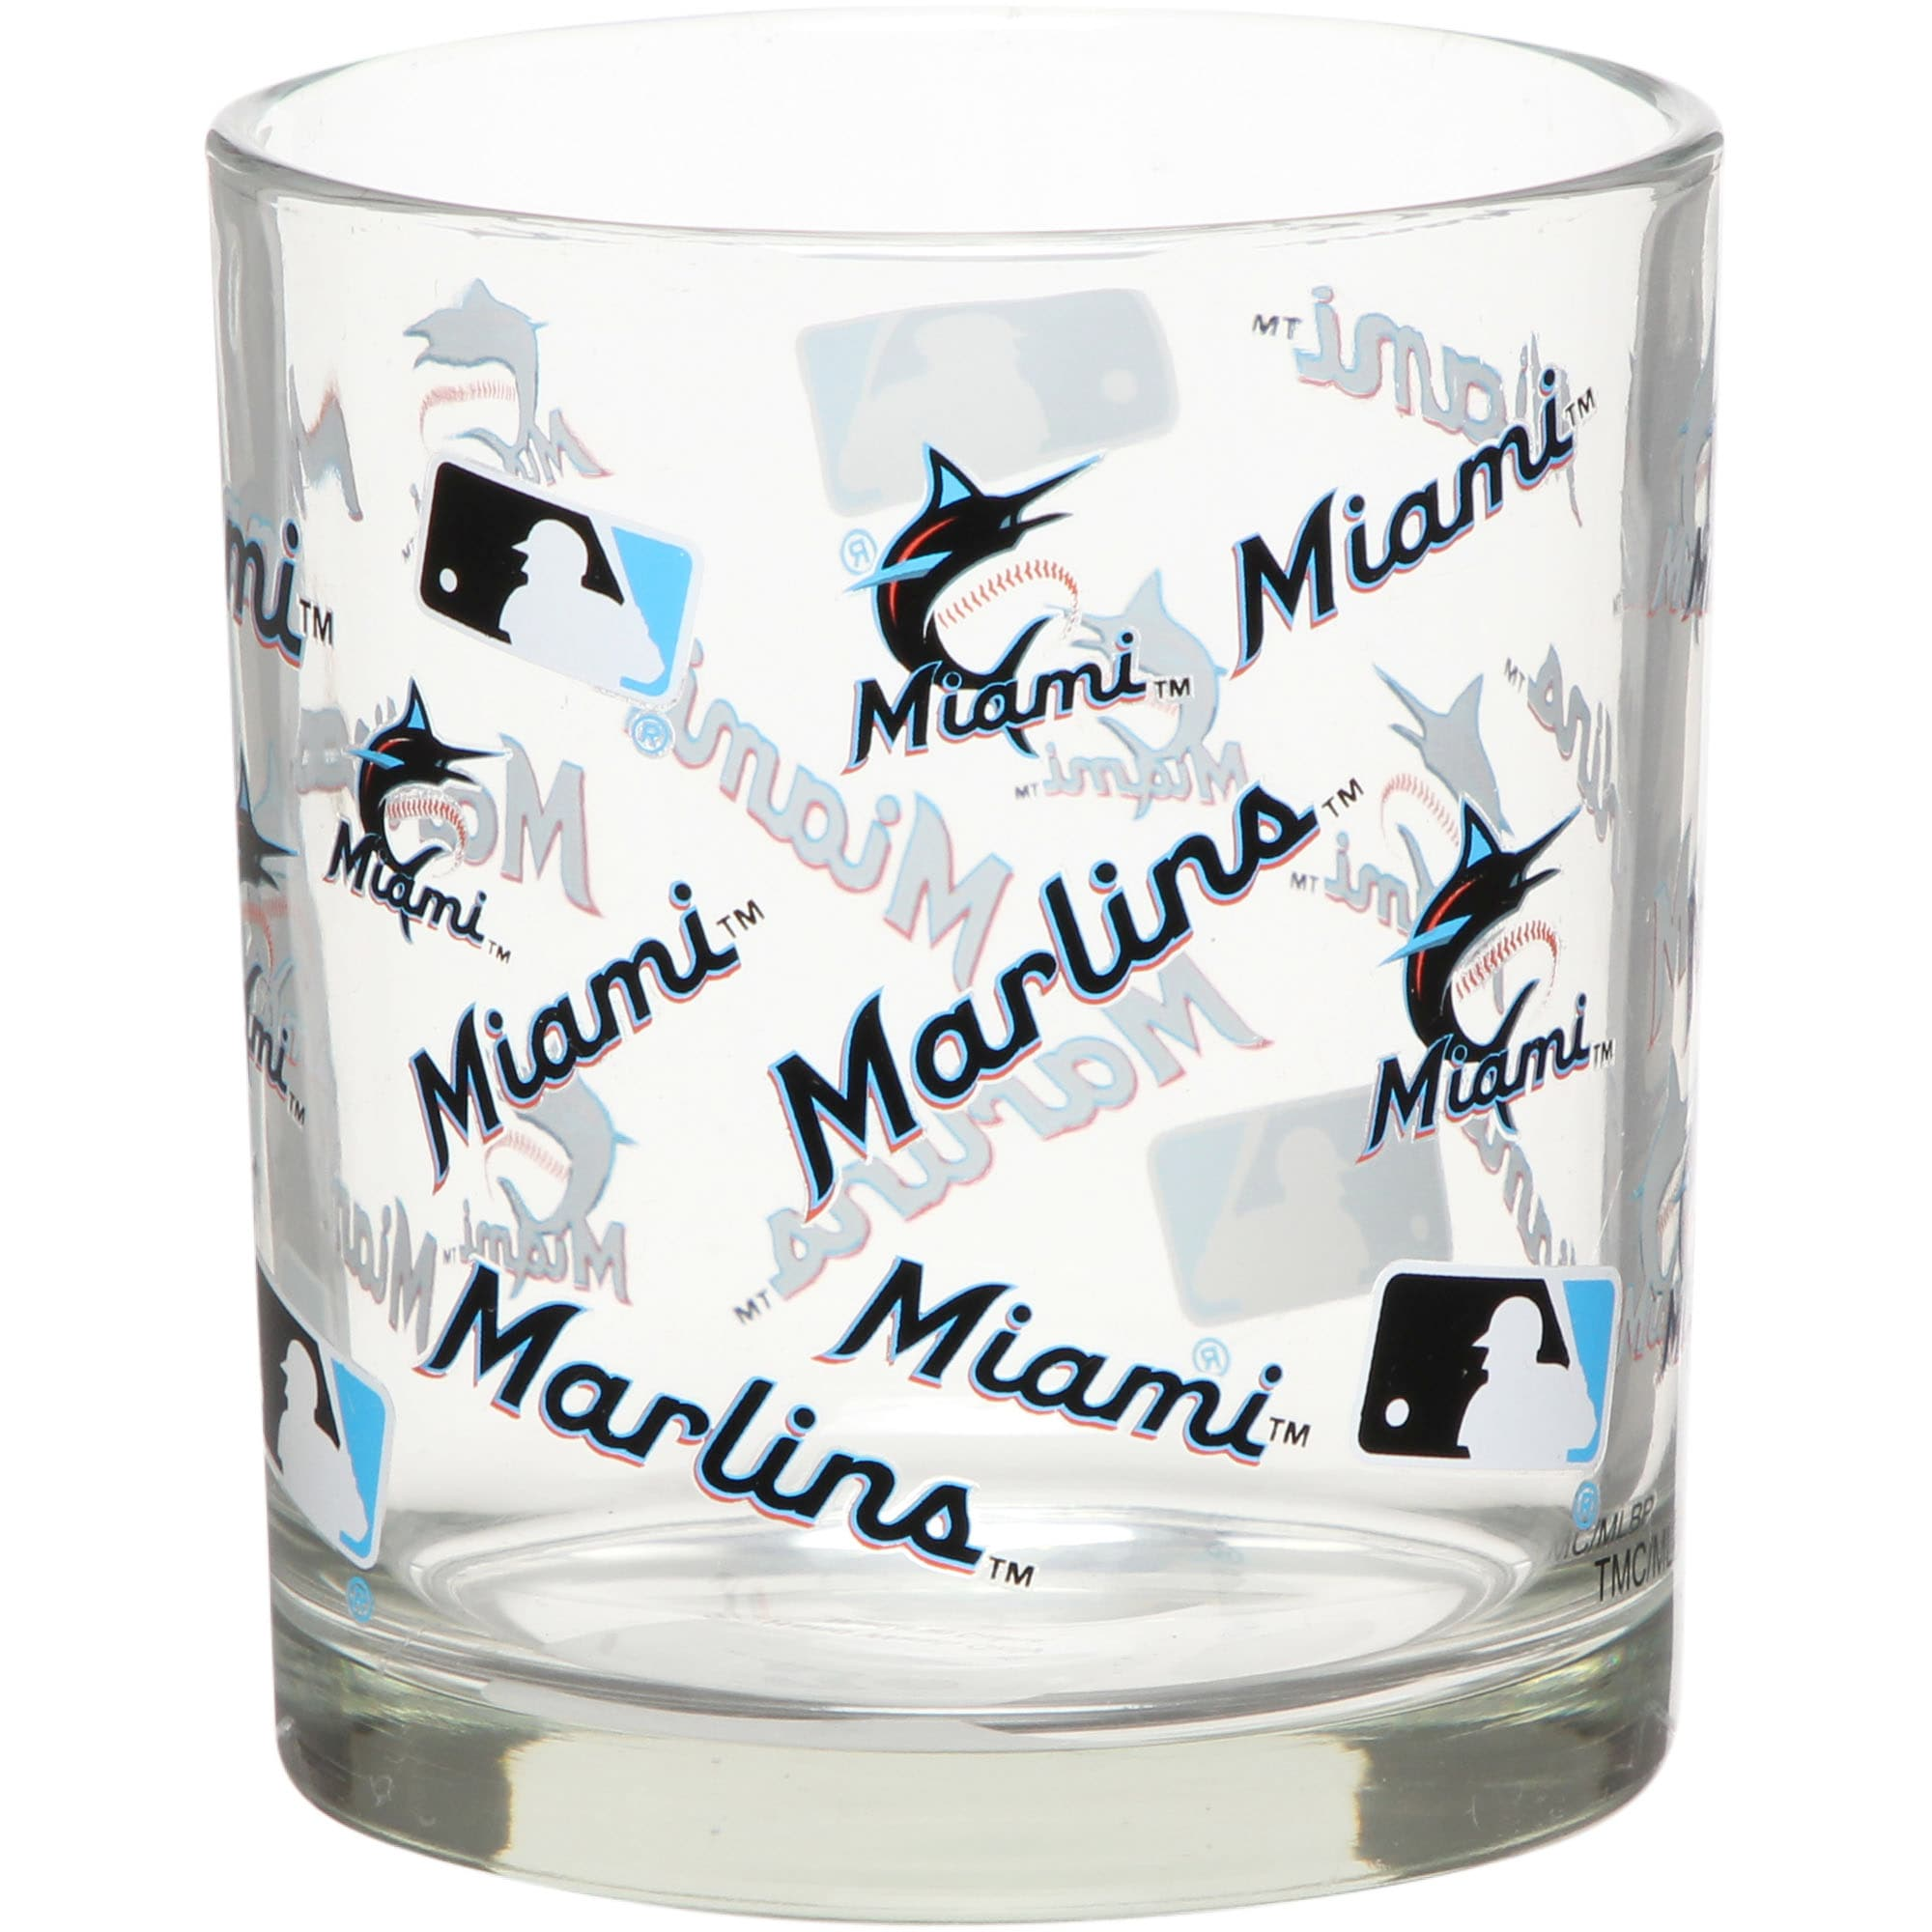 Miami Marlins Full Wrap Rocks Glass